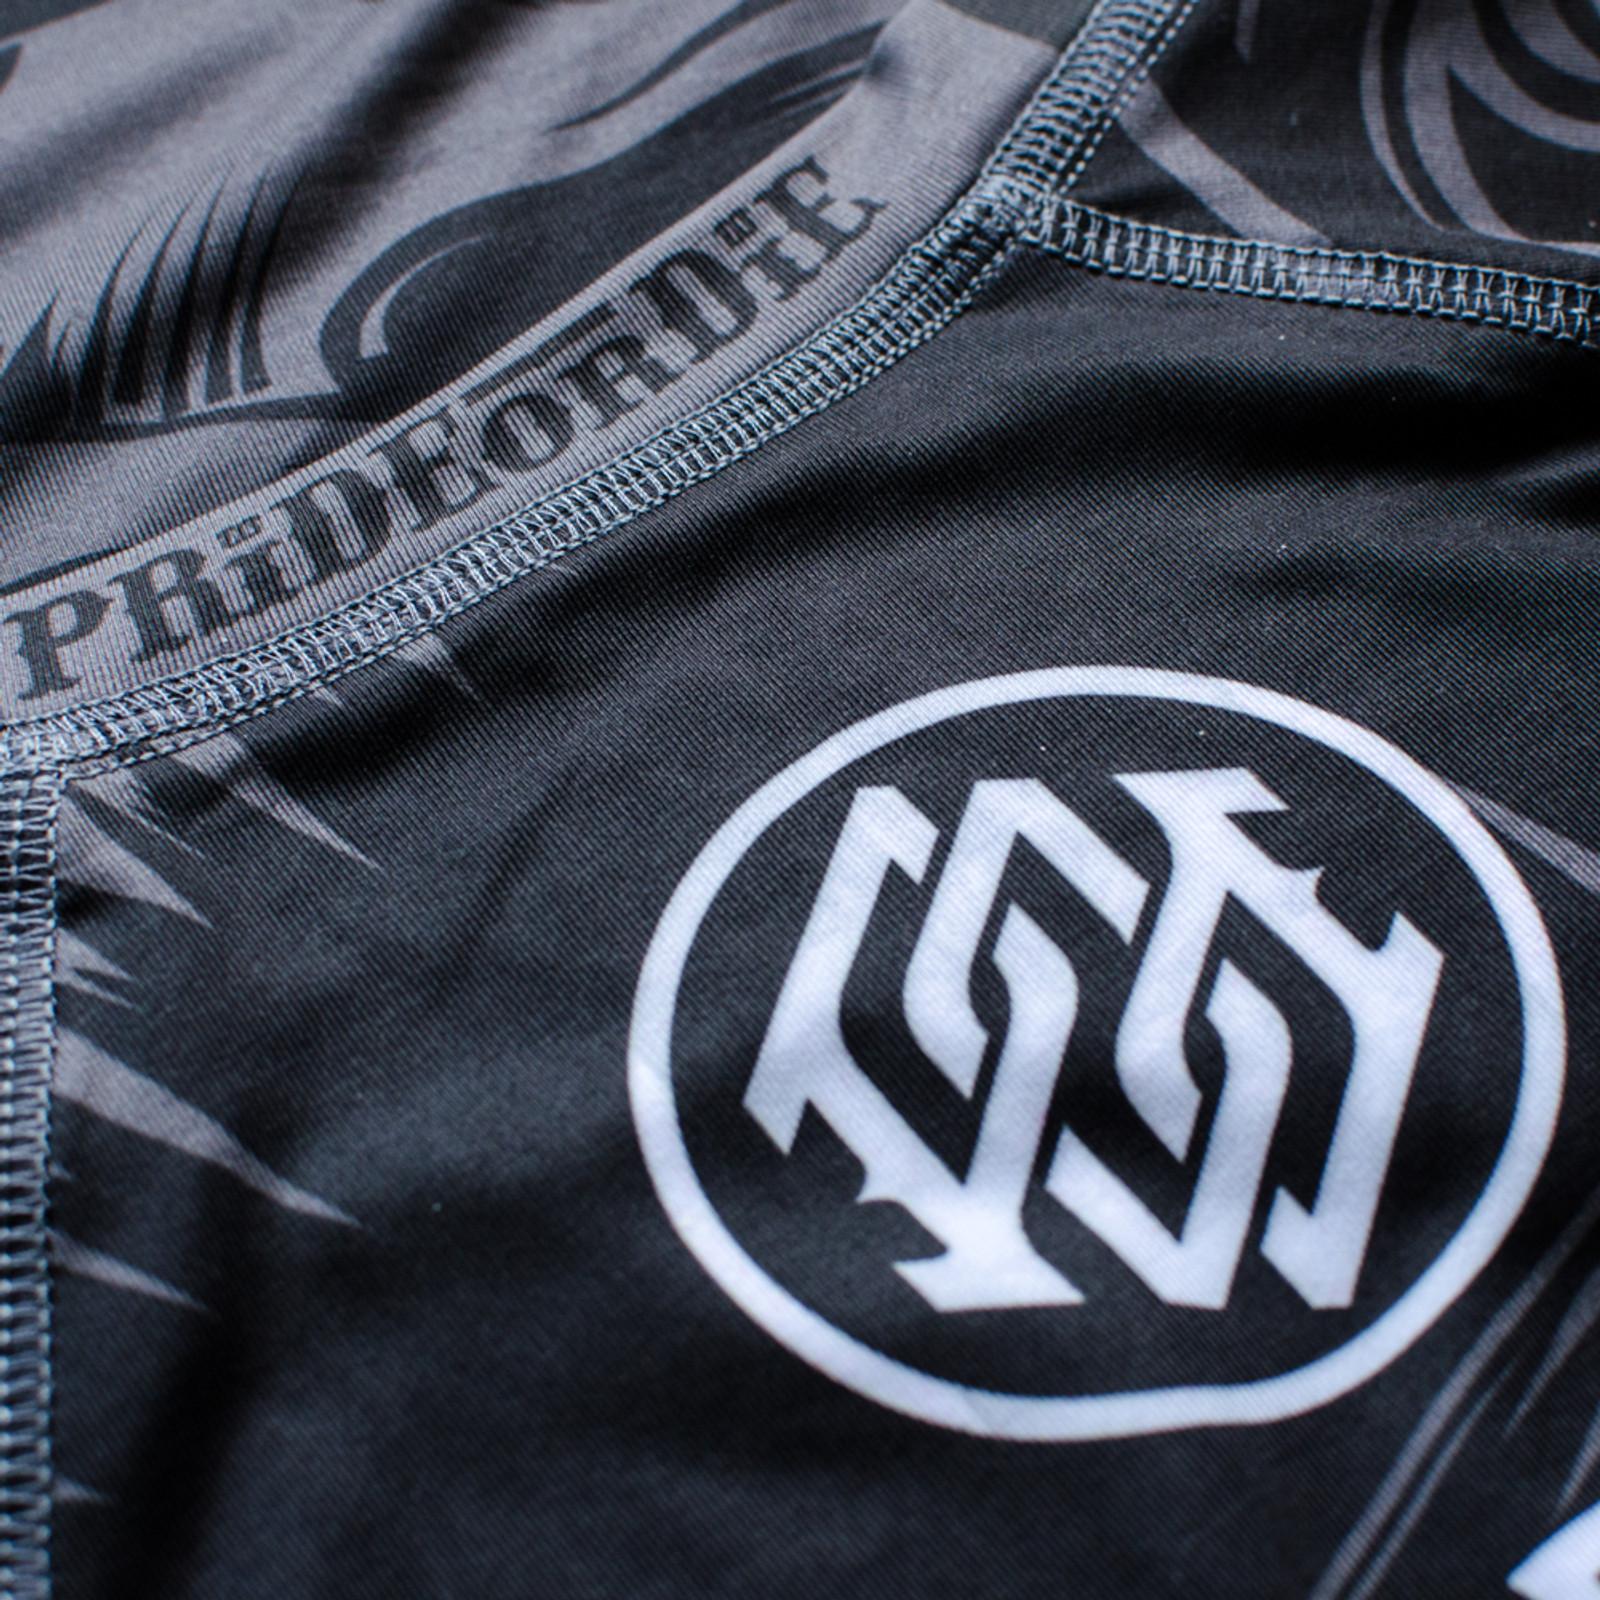 Pride or Die Langarm Rashguard Brawlerz Schwarz UVP 49,90 MMA BJJ Grappling